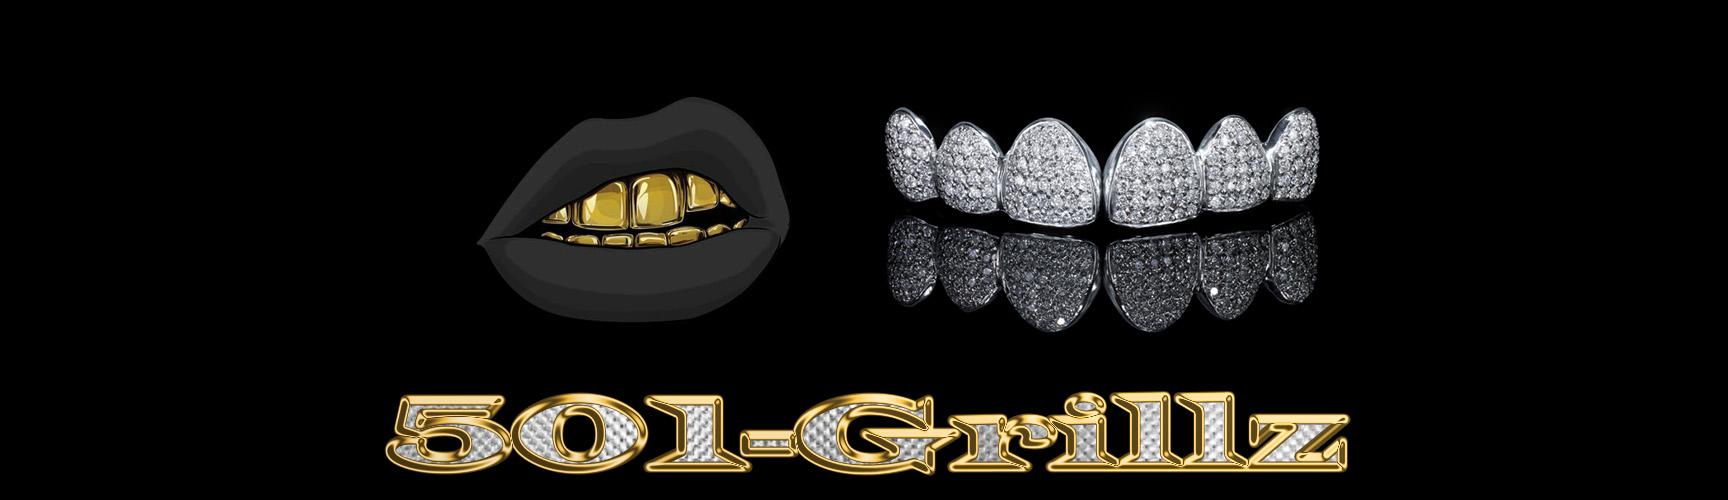 501 Grillz Gold Diamond Prospectors